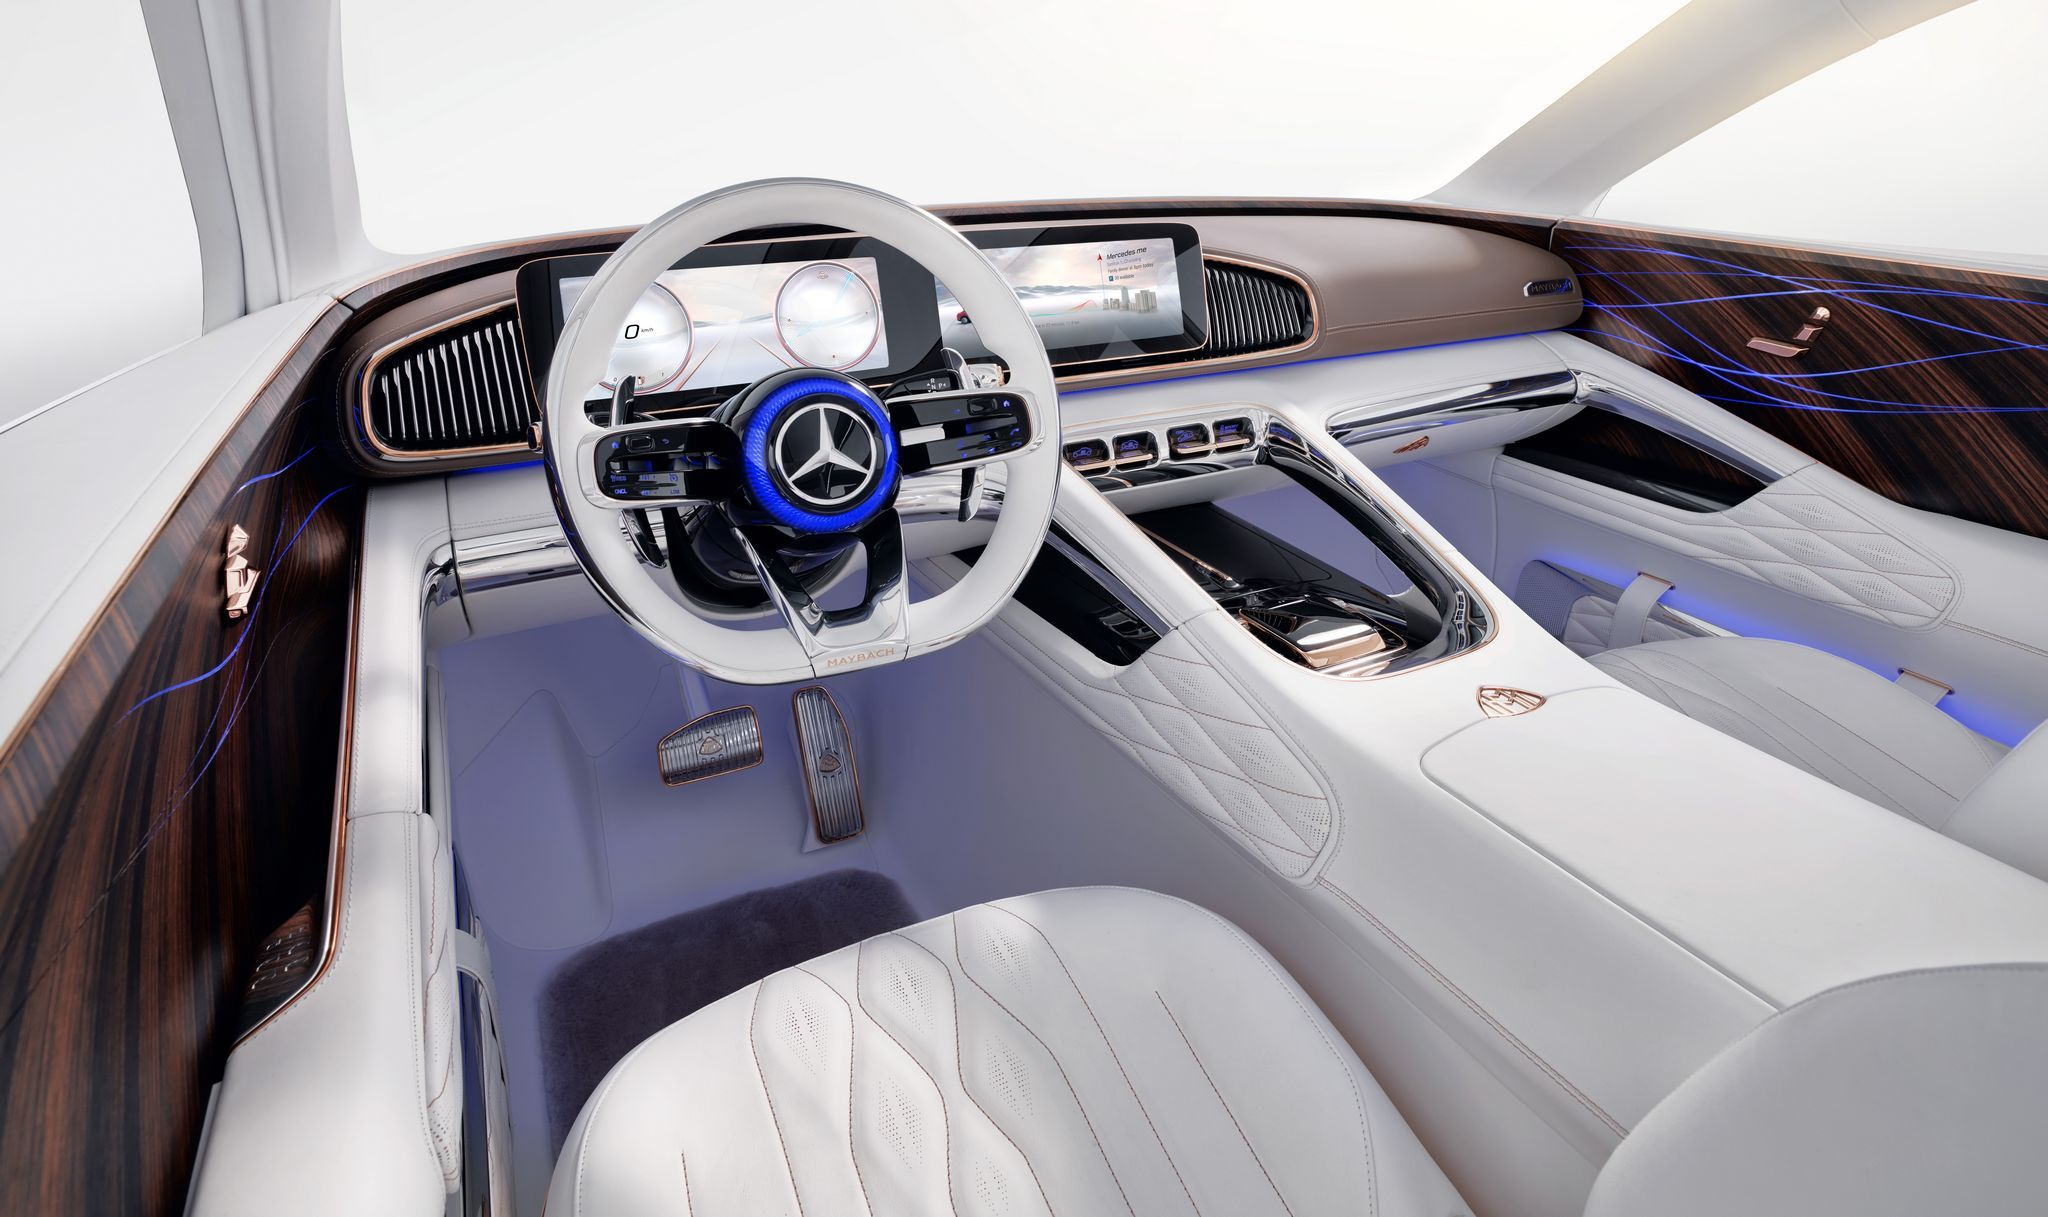 erste bilder der vision mercedes-maybach ultimate luxury | car ui ux